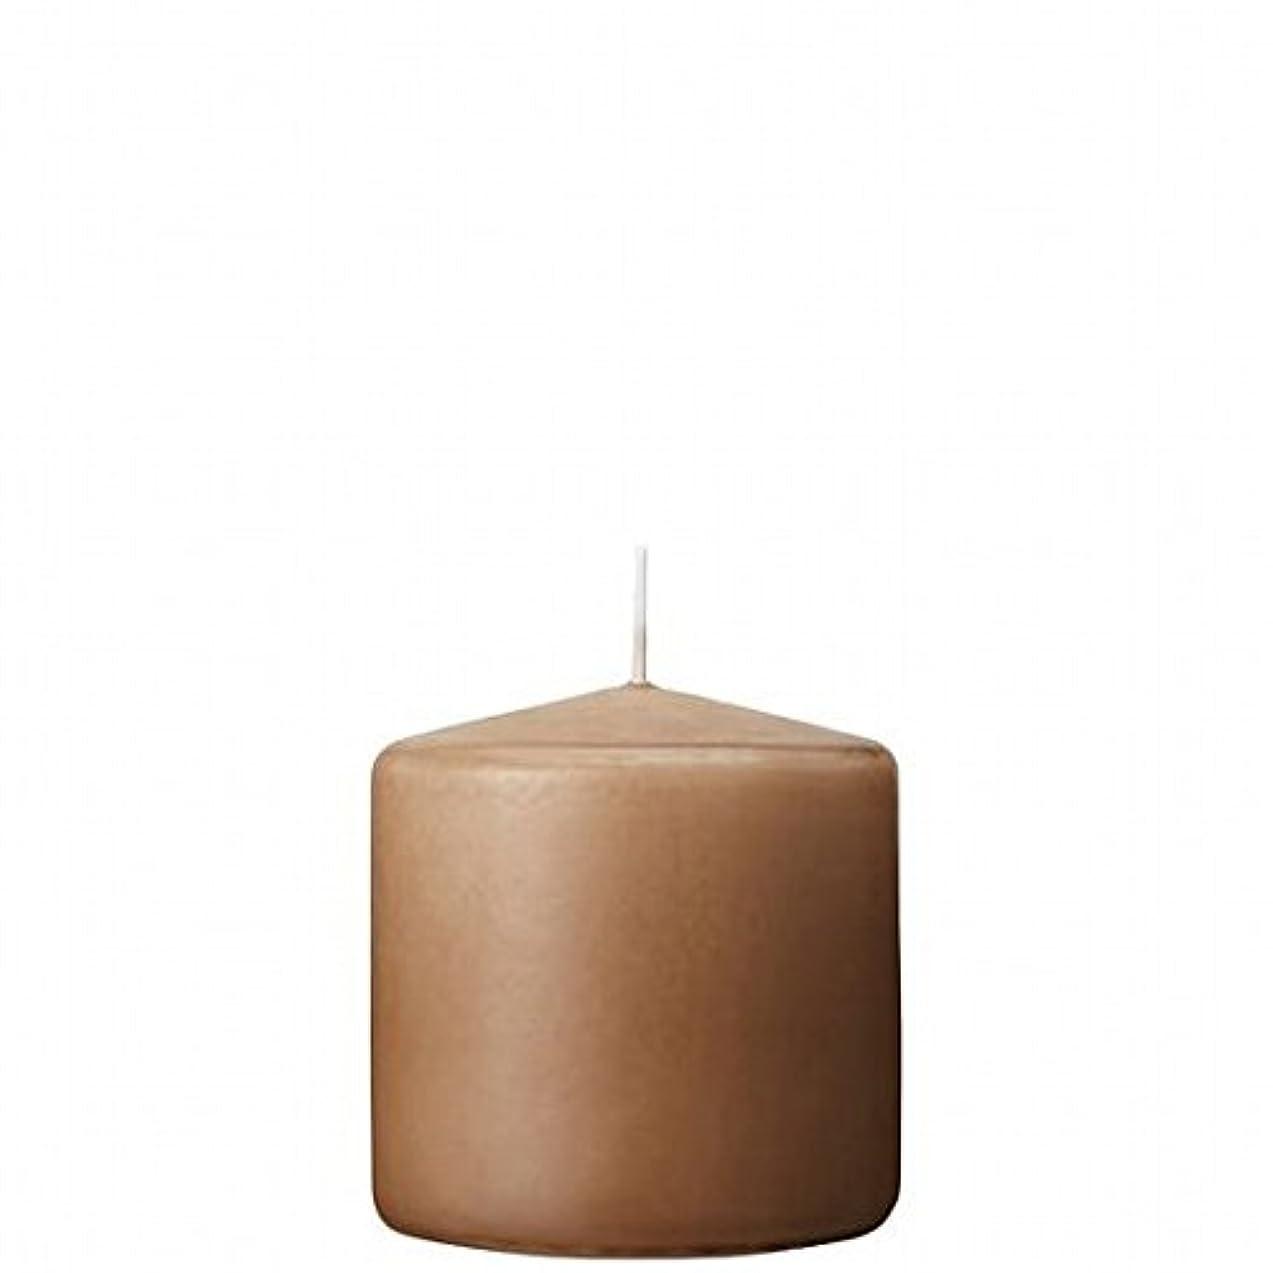 kameyama candle(カメヤマキャンドル) 3×3ベルトップピラーキャンドル 「 モカ 」(A9730000MO)